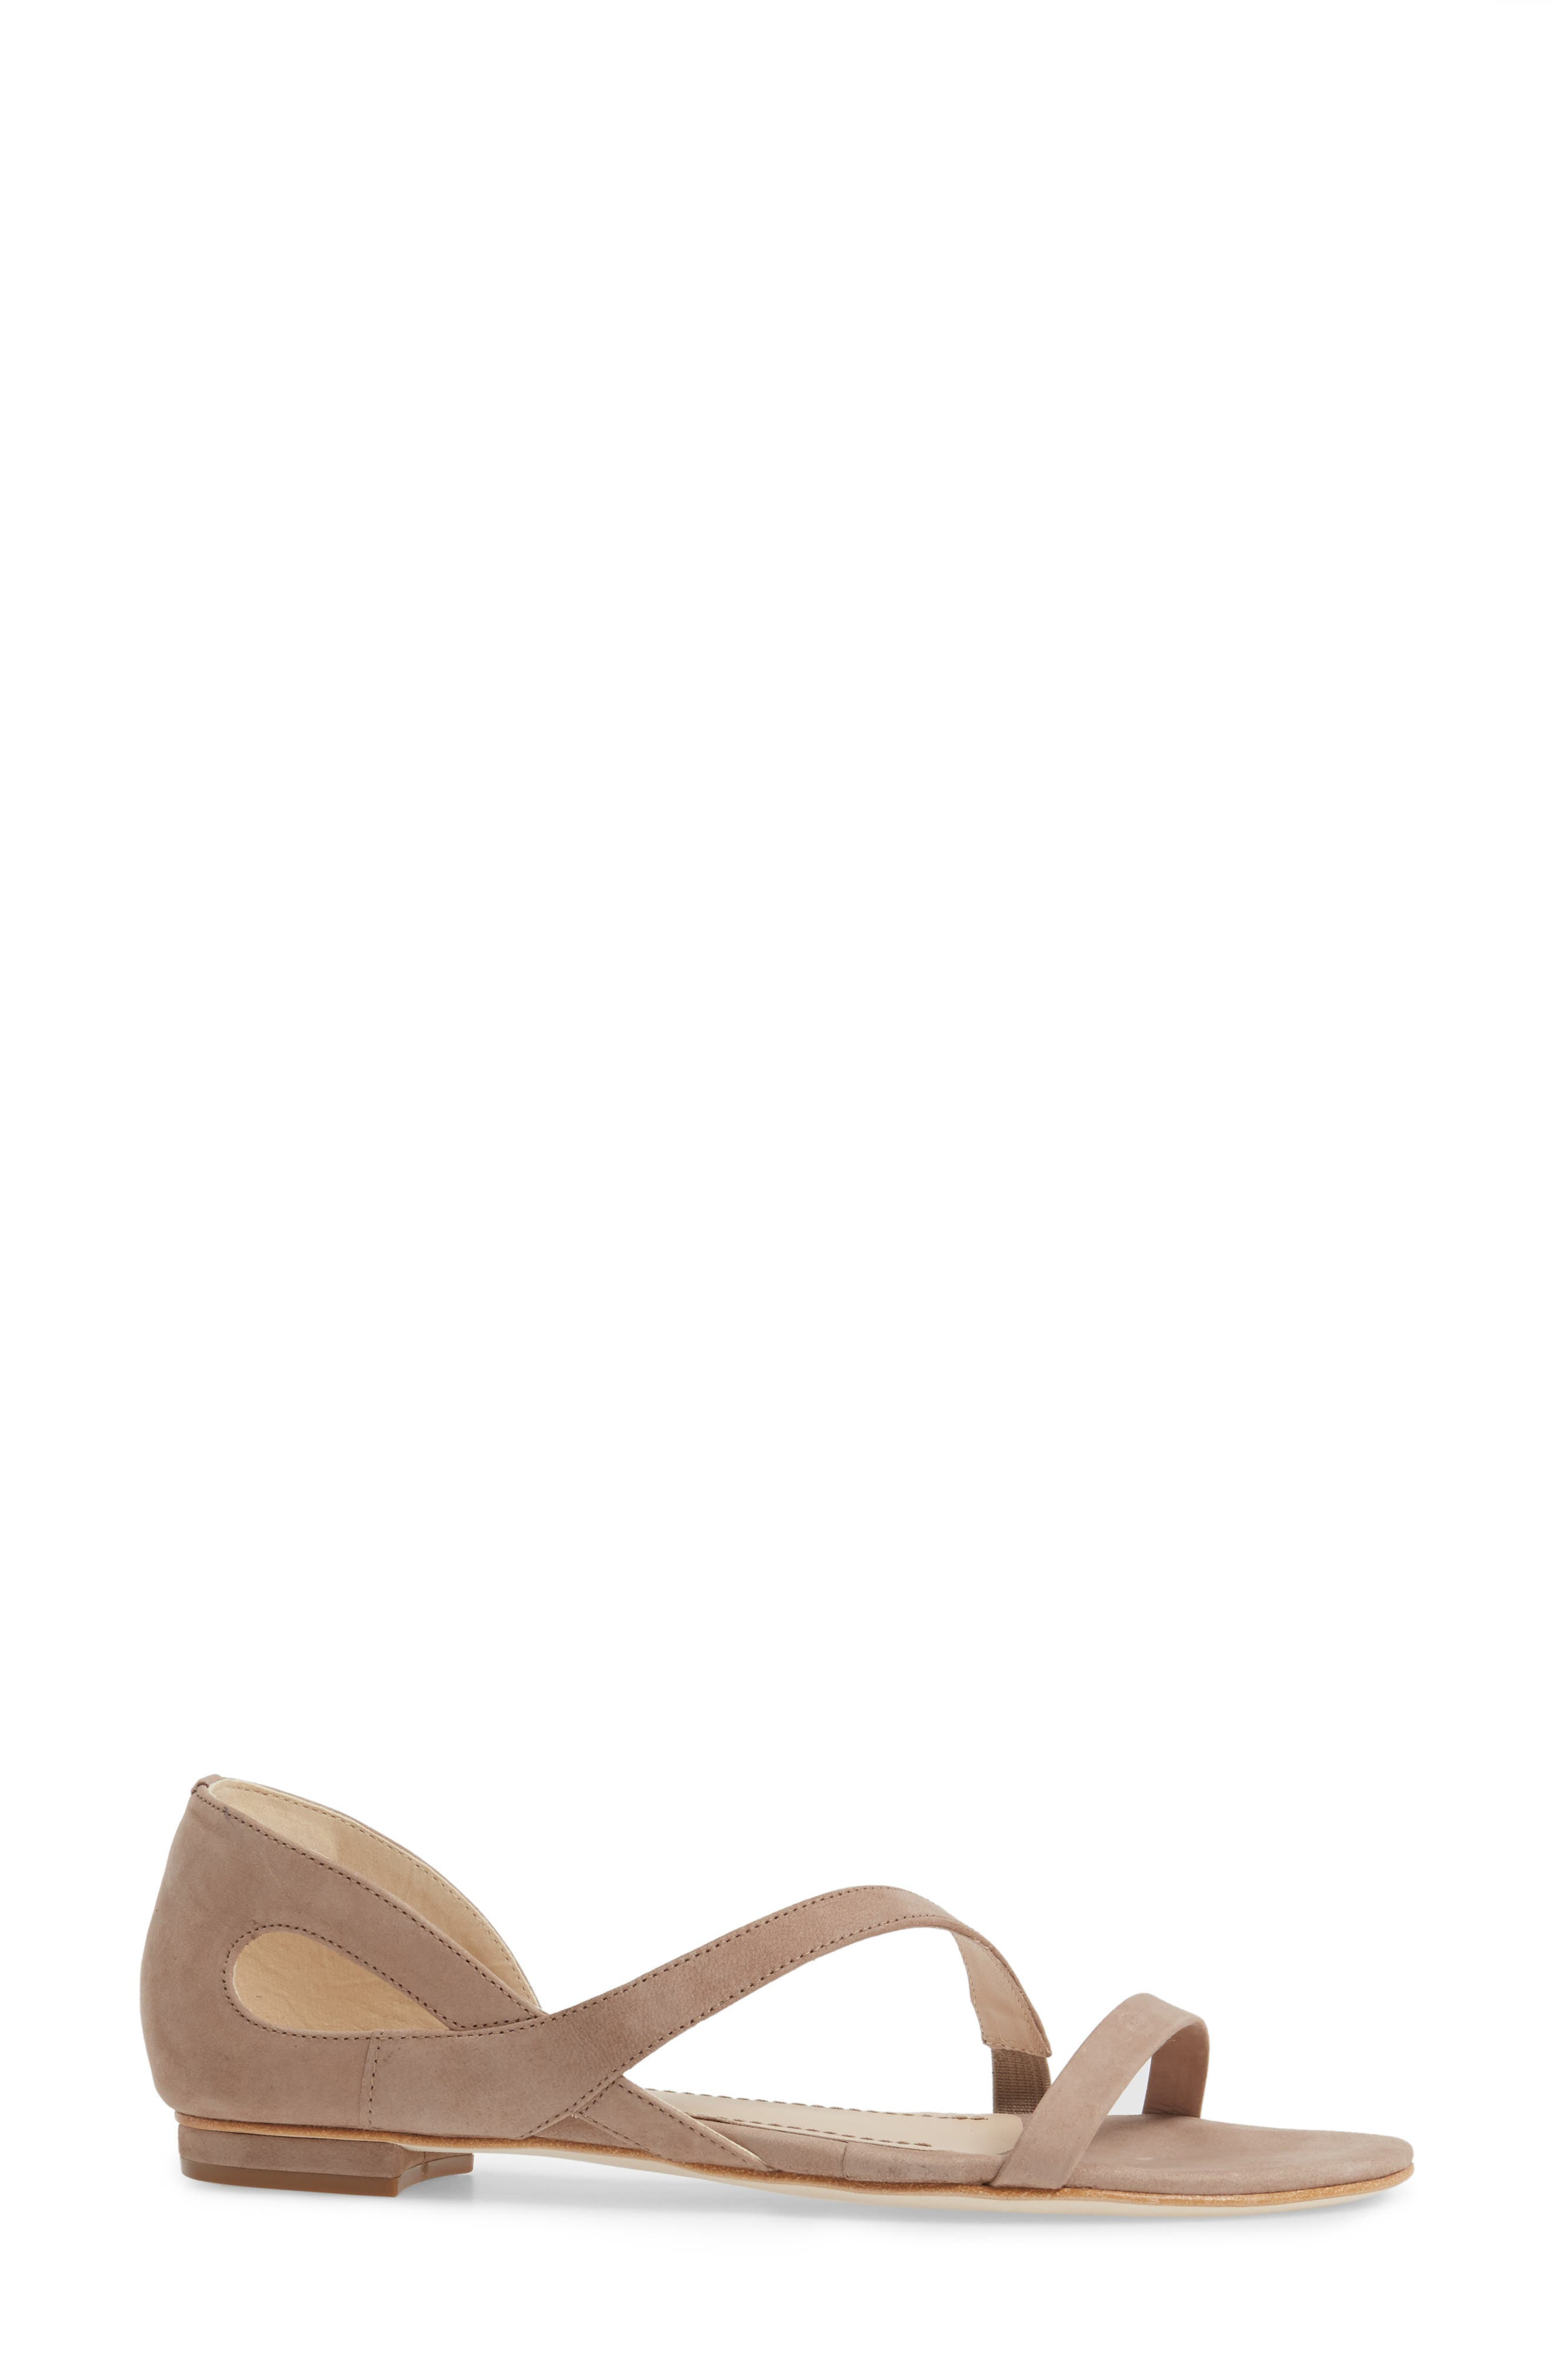 Jeanne Sandal,                             Alternate thumbnail 3, color,                             Taupe Leather